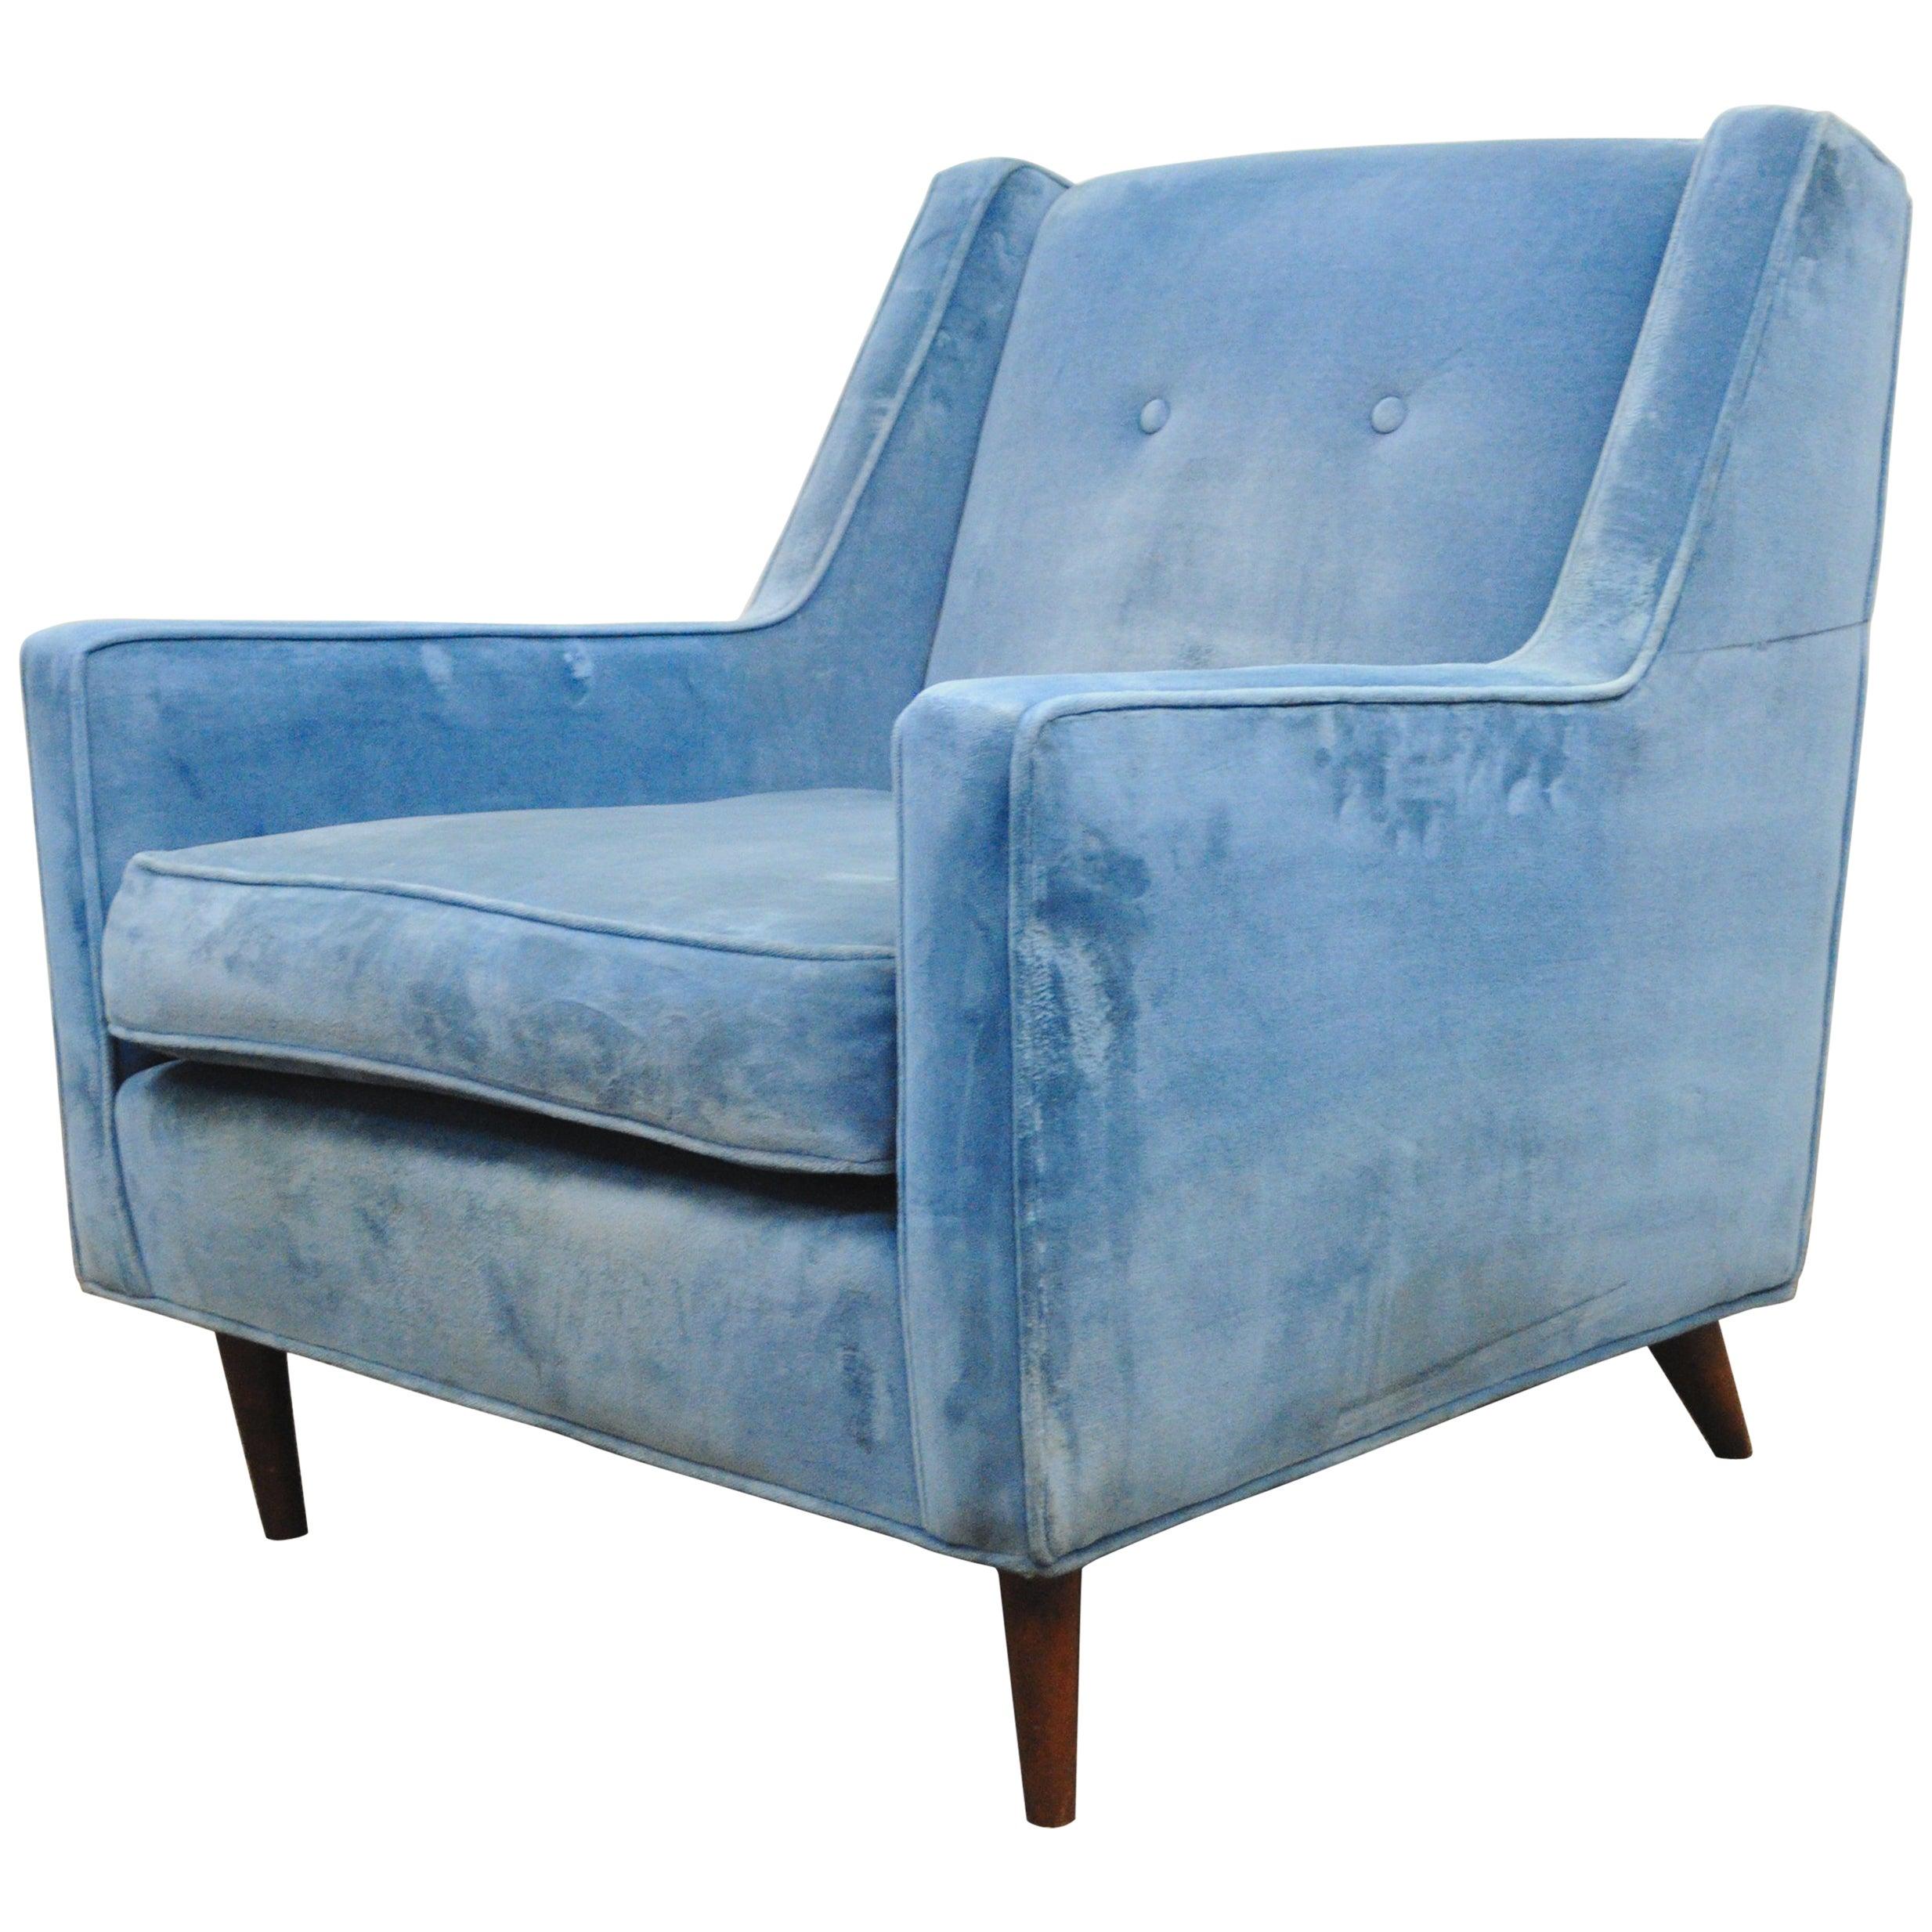 Vintage Mid Century Modern Walnut Frame Blue Club Lounge Chair after Paul McCobb